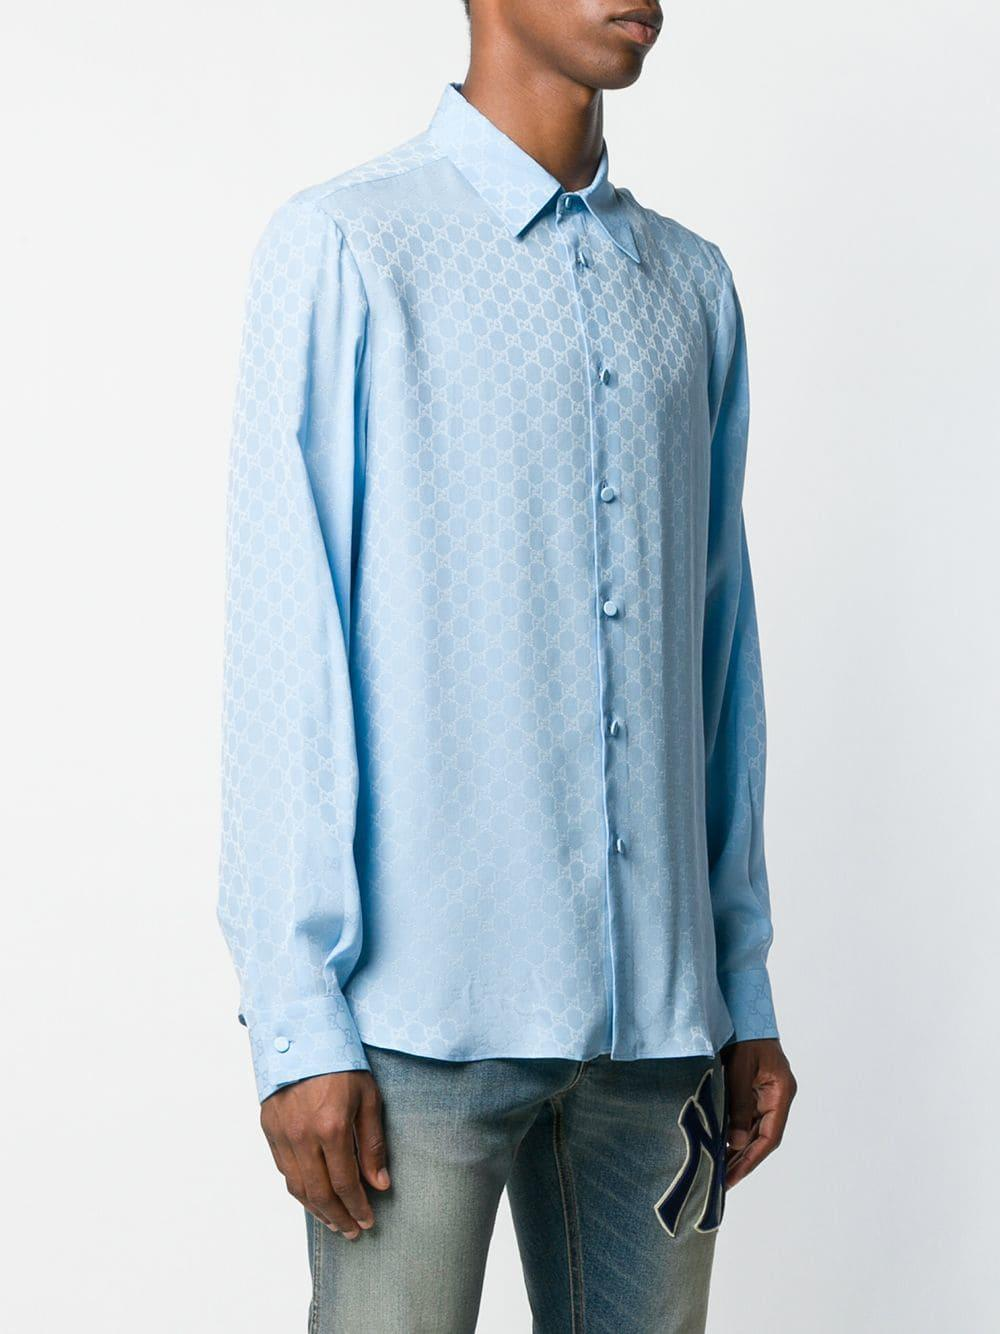 8269fc4b544 Gucci - Blue GG Supreme Pattern Shirt for Men - Lyst. View fullscreen